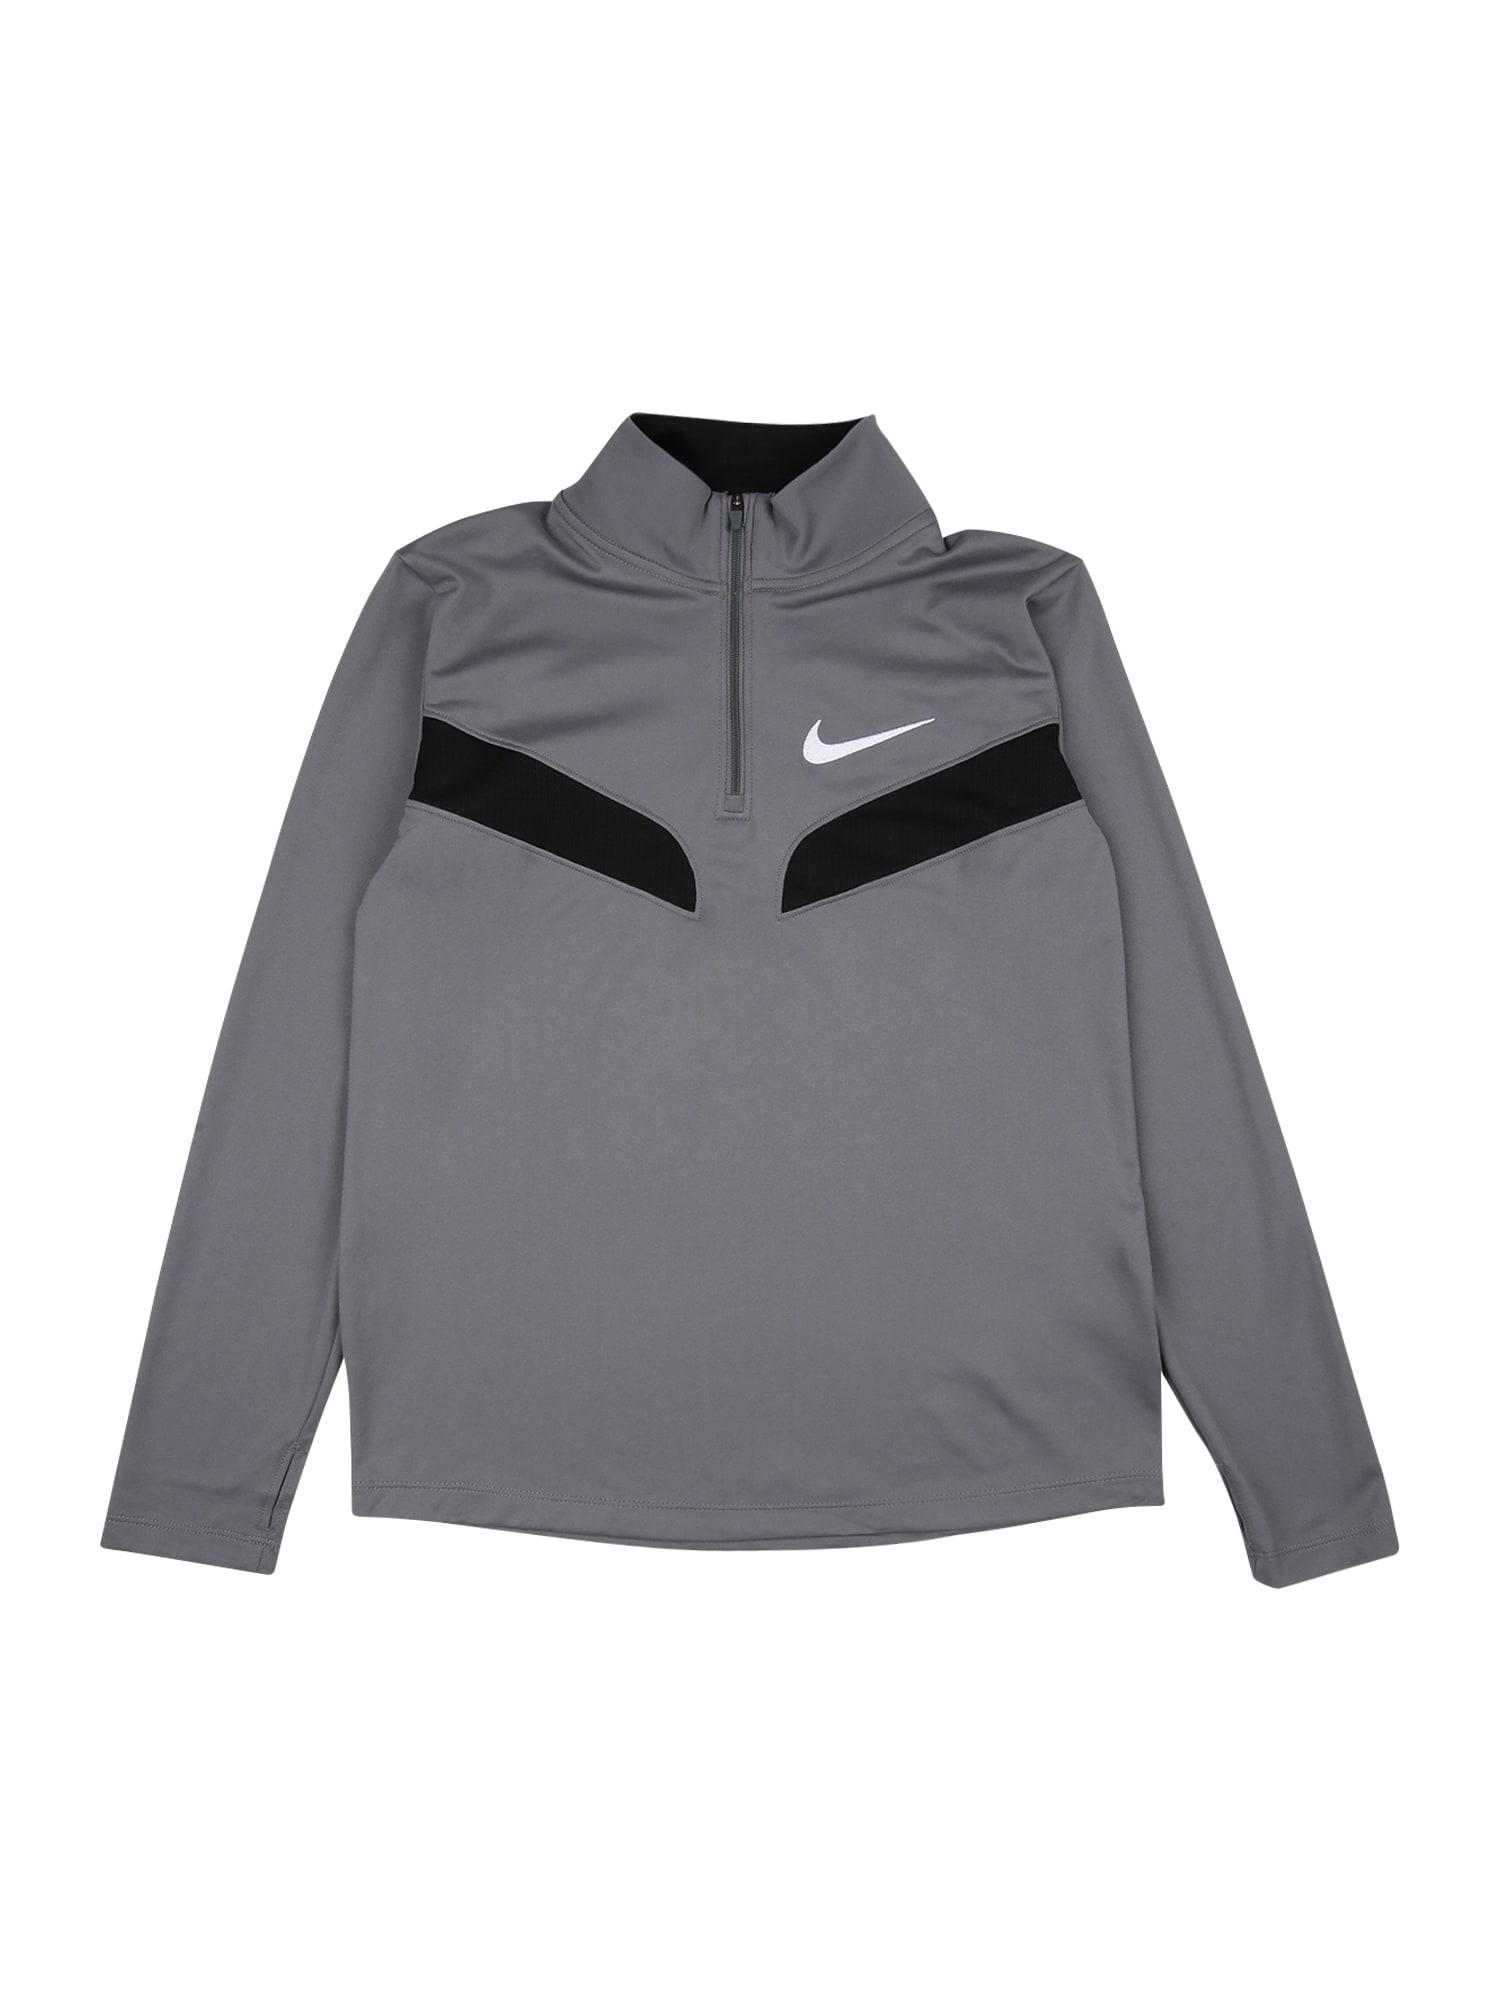 NIKE Sportinio tipo megztinis pilka / juoda / balta